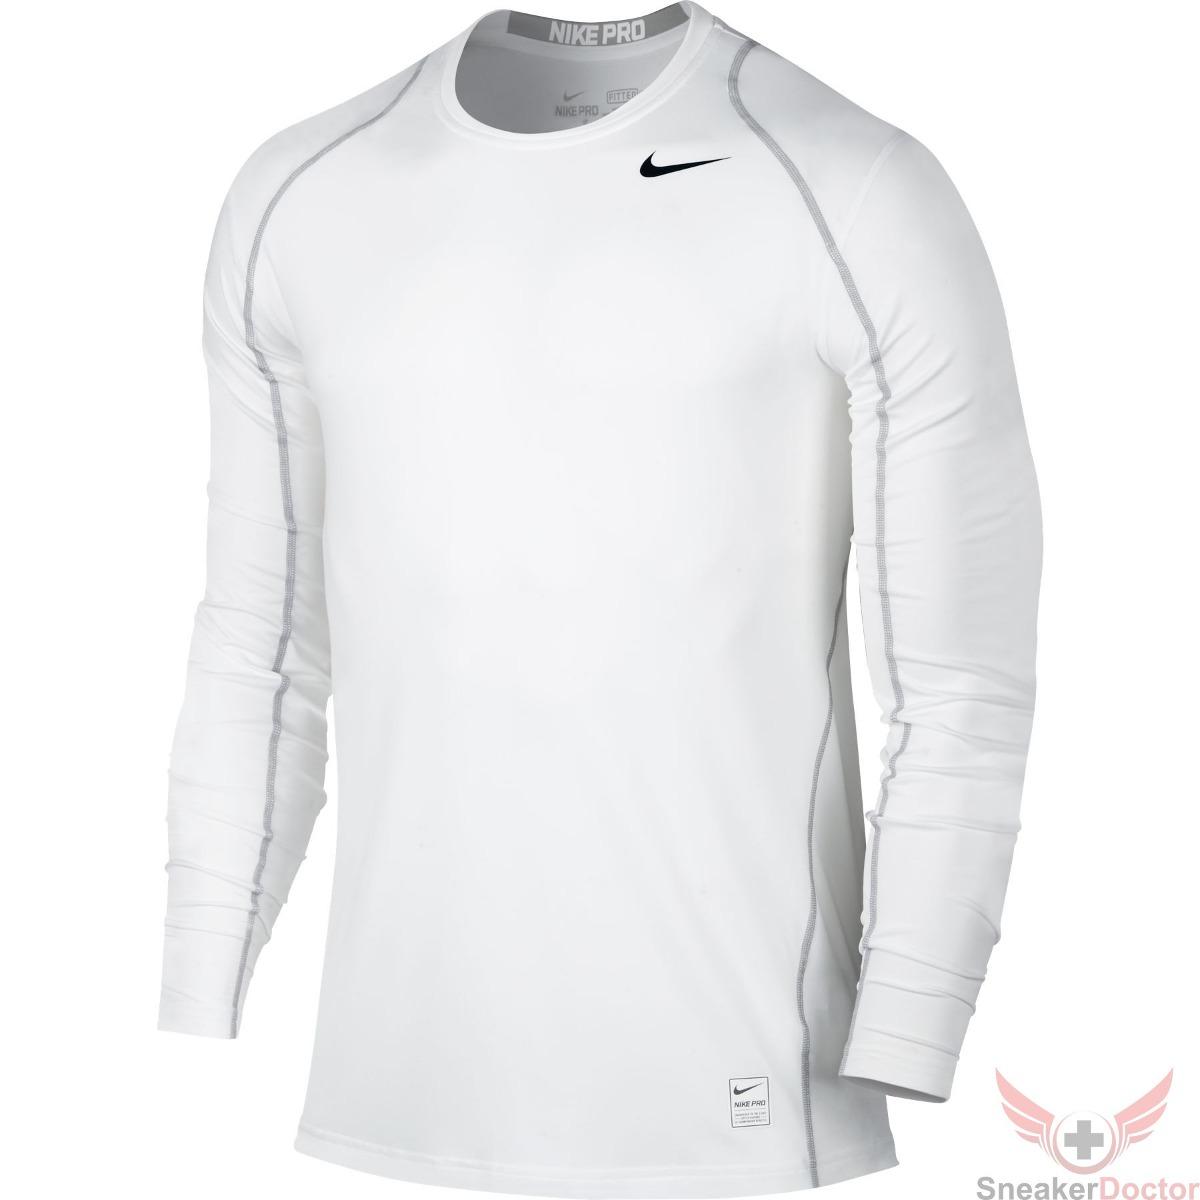 eb4f979e0361f Camiseta Licra Nike Pro Cool Fitted Manga Larga Compresión ...